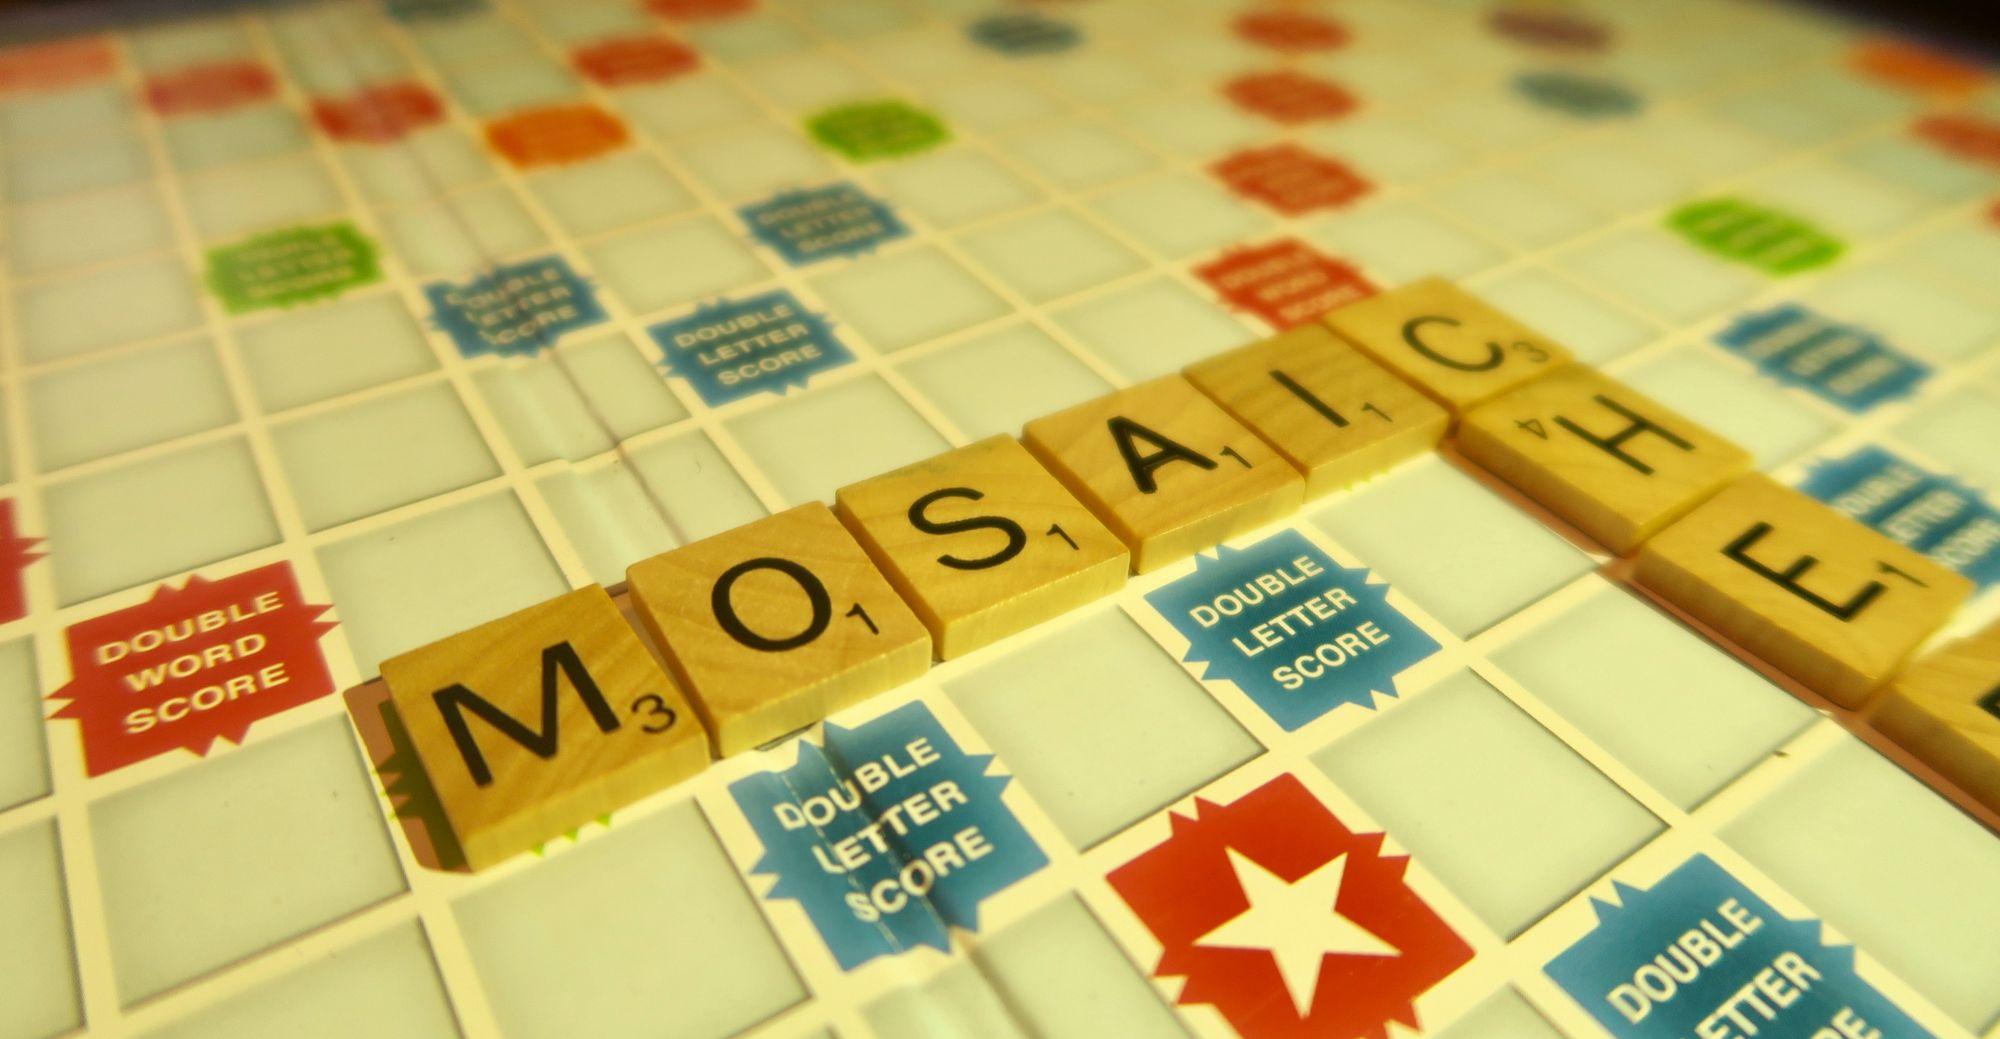 MOSAIC strategy framework